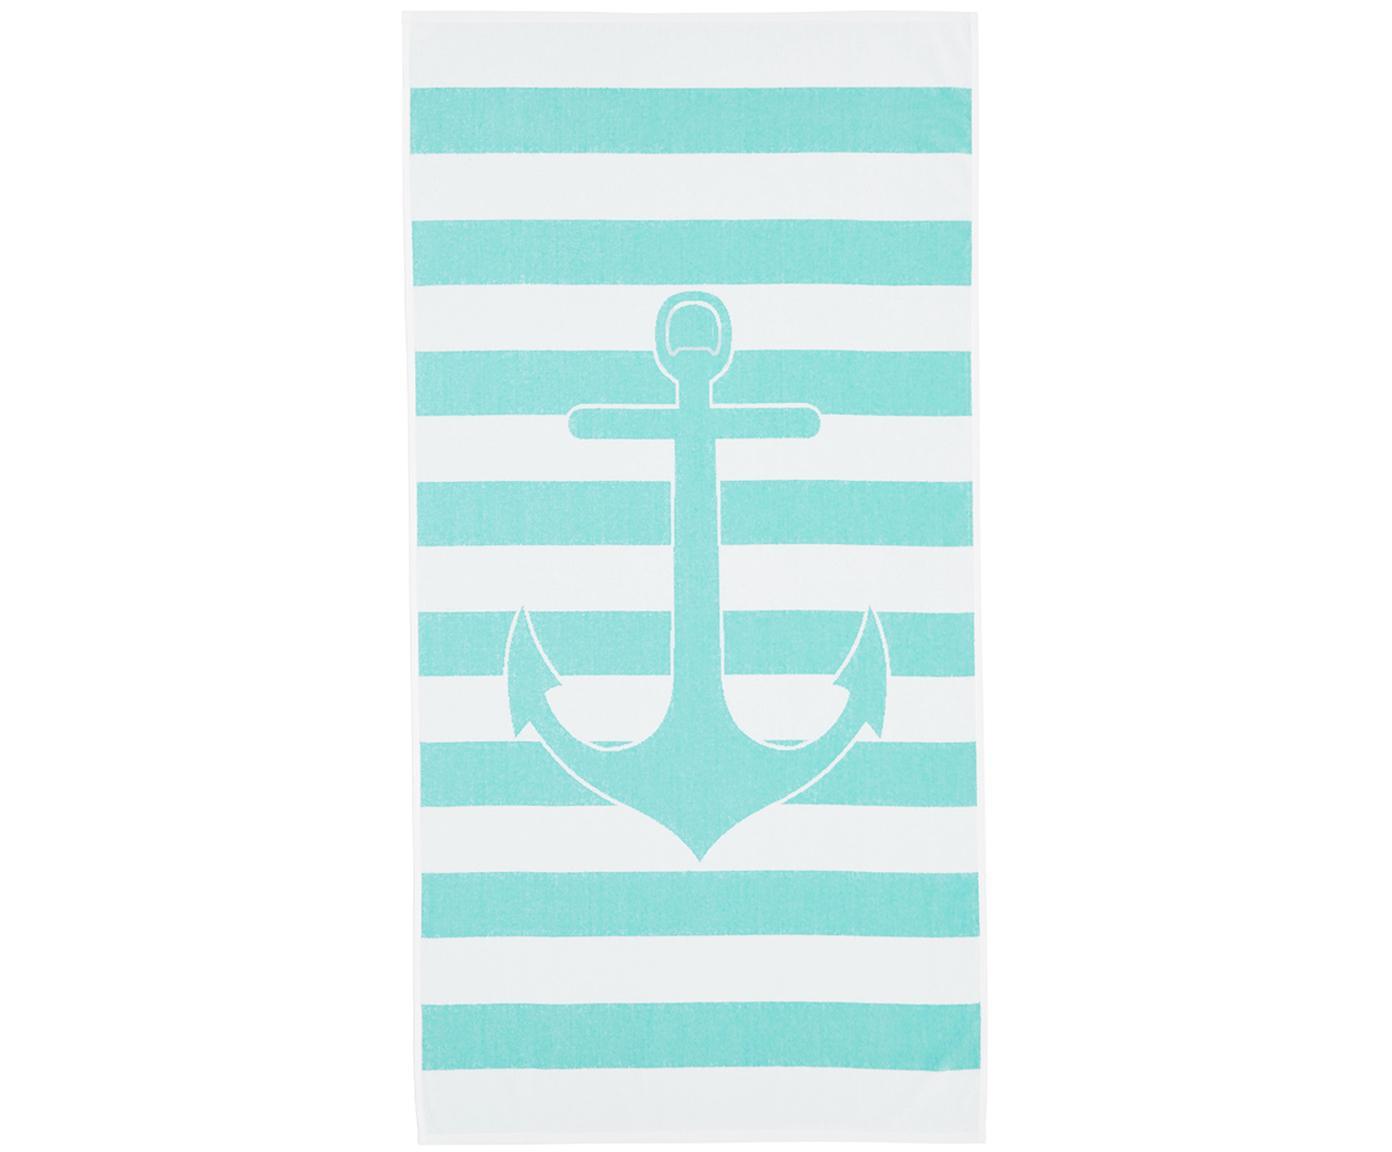 Ręcznik plażowy Anon, Bawełna Niska gramatura 380 g/m², Turkusowy, biały, S 80 x D 160 cm